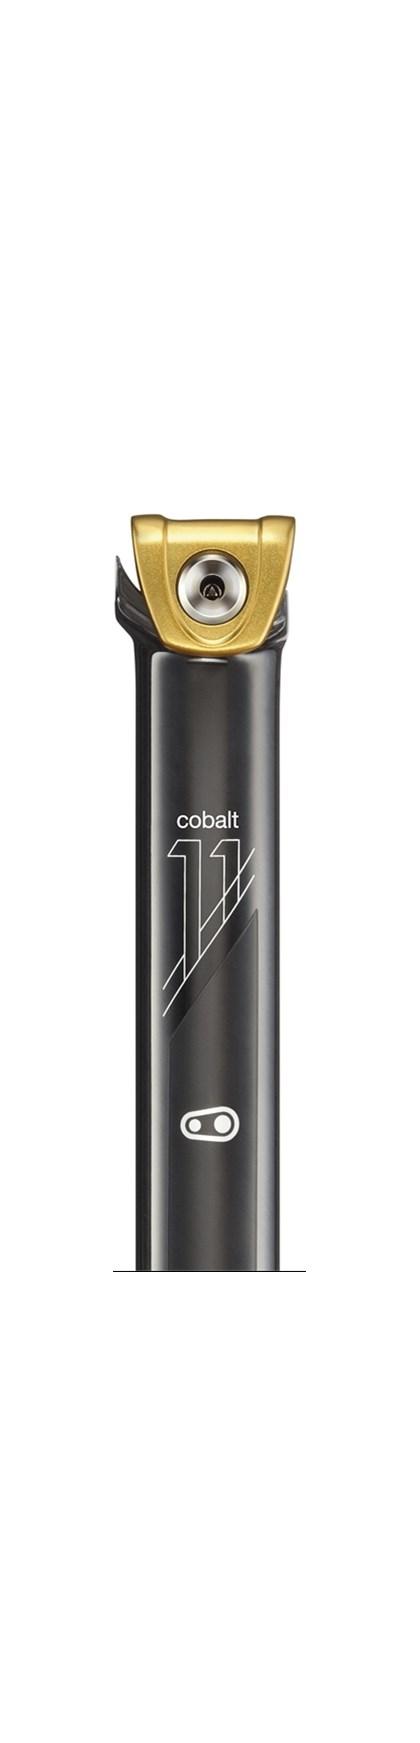 Canote de Selim Crank Brothers Cobalt 11 sem Recuo 400mm